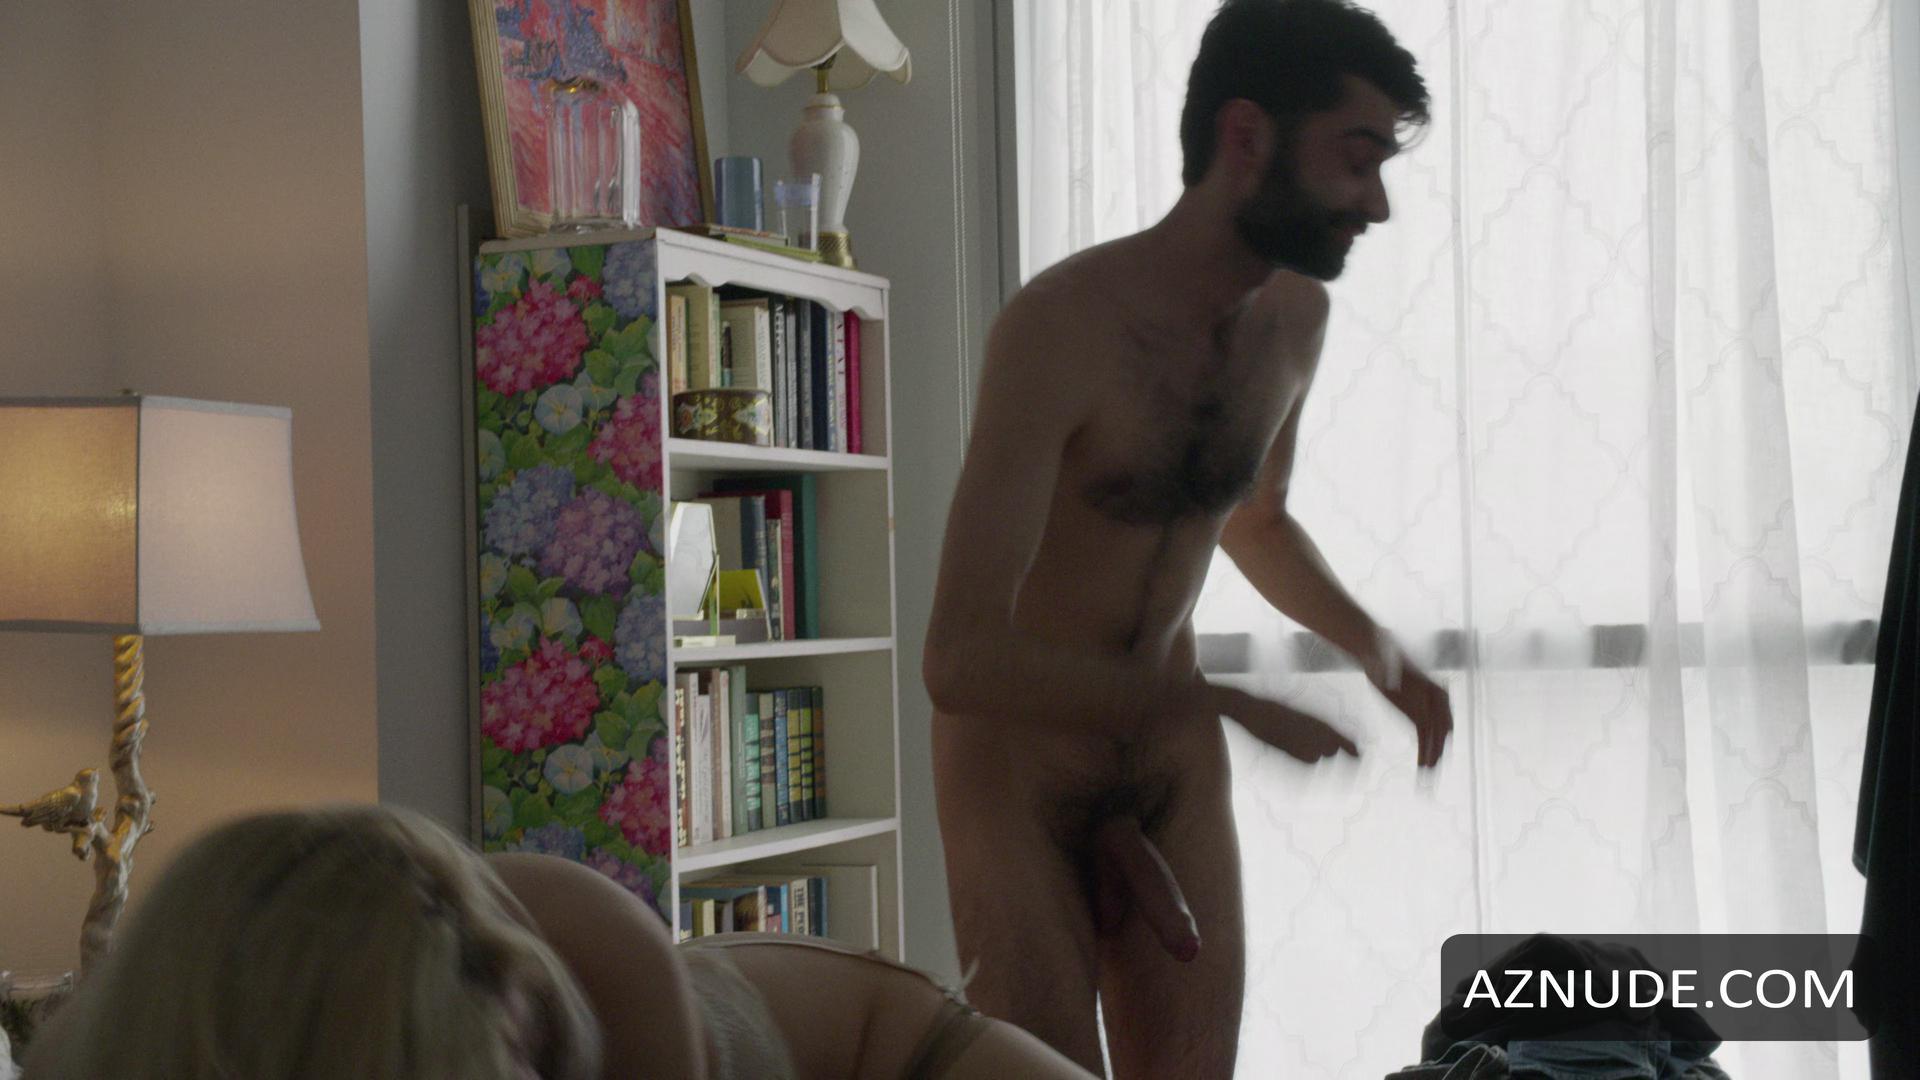 Pity, Men getting nude on ellen something